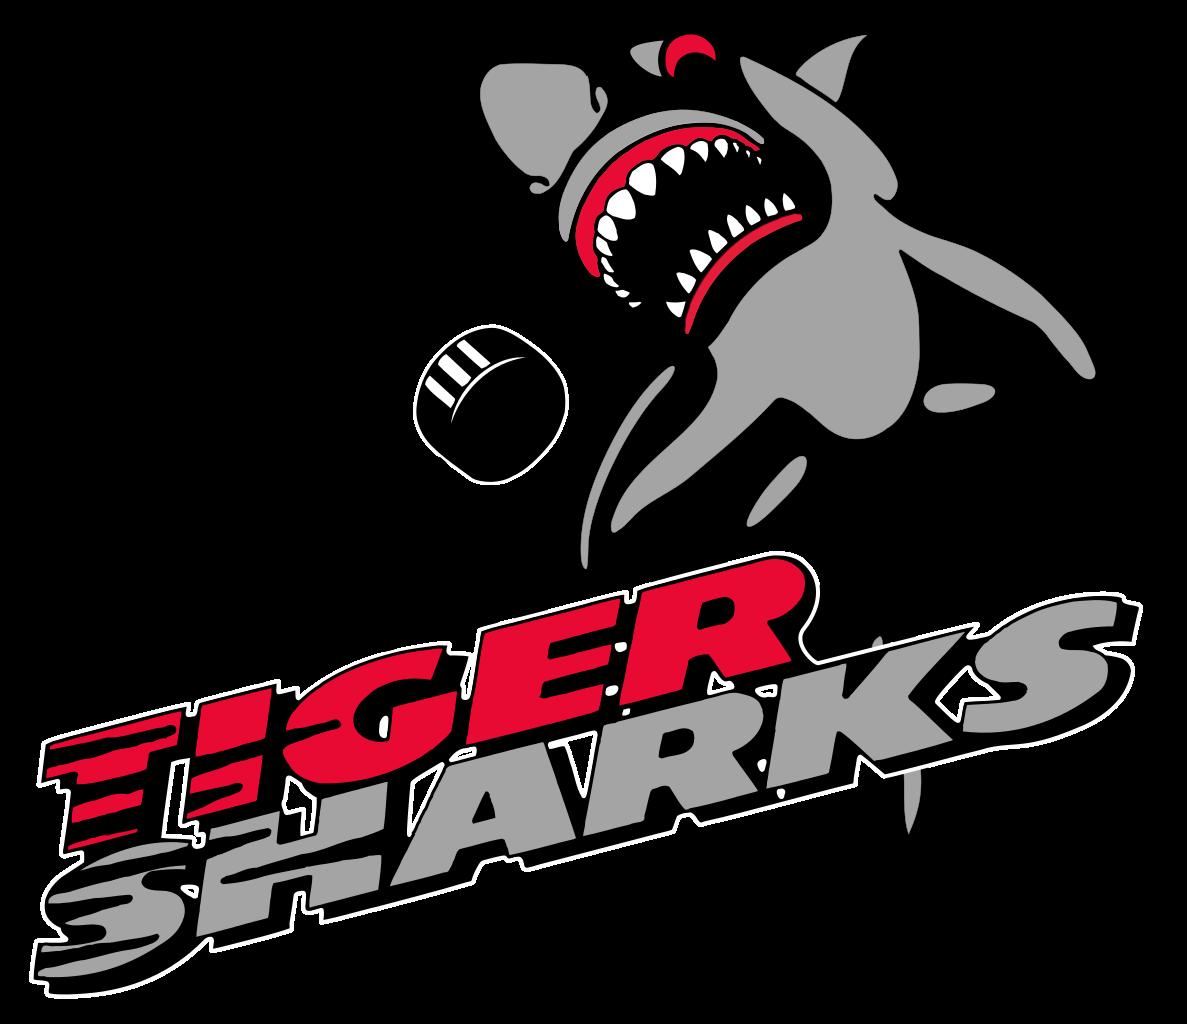 Tiger Shark svg #17, Download drawings